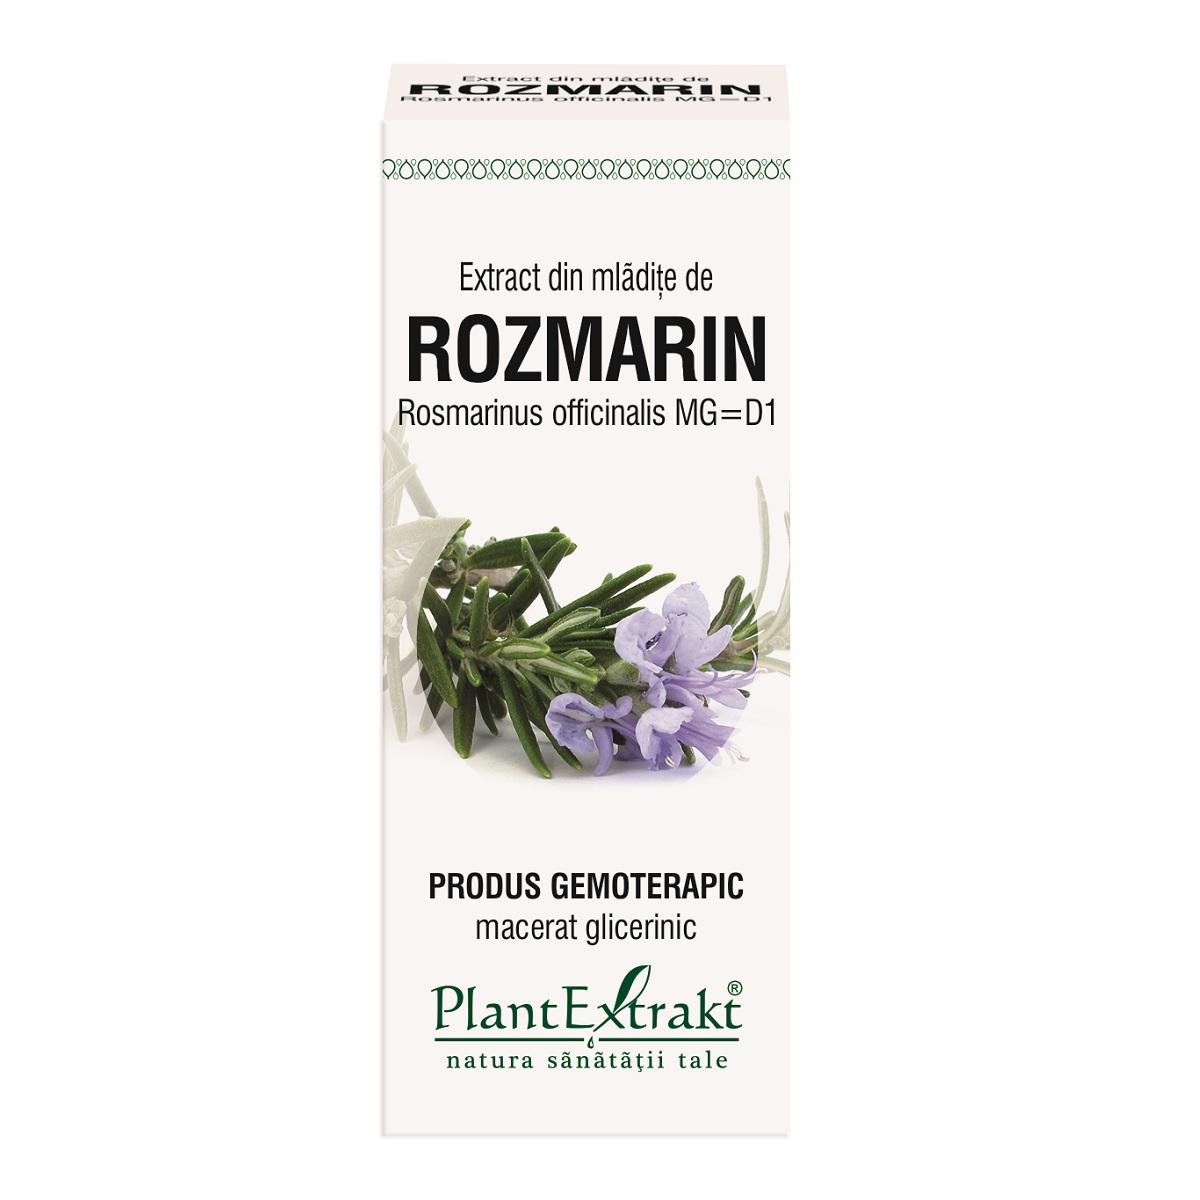 Extract din mlădițe de Rozmarin, 50 ml, Plant Extrakt